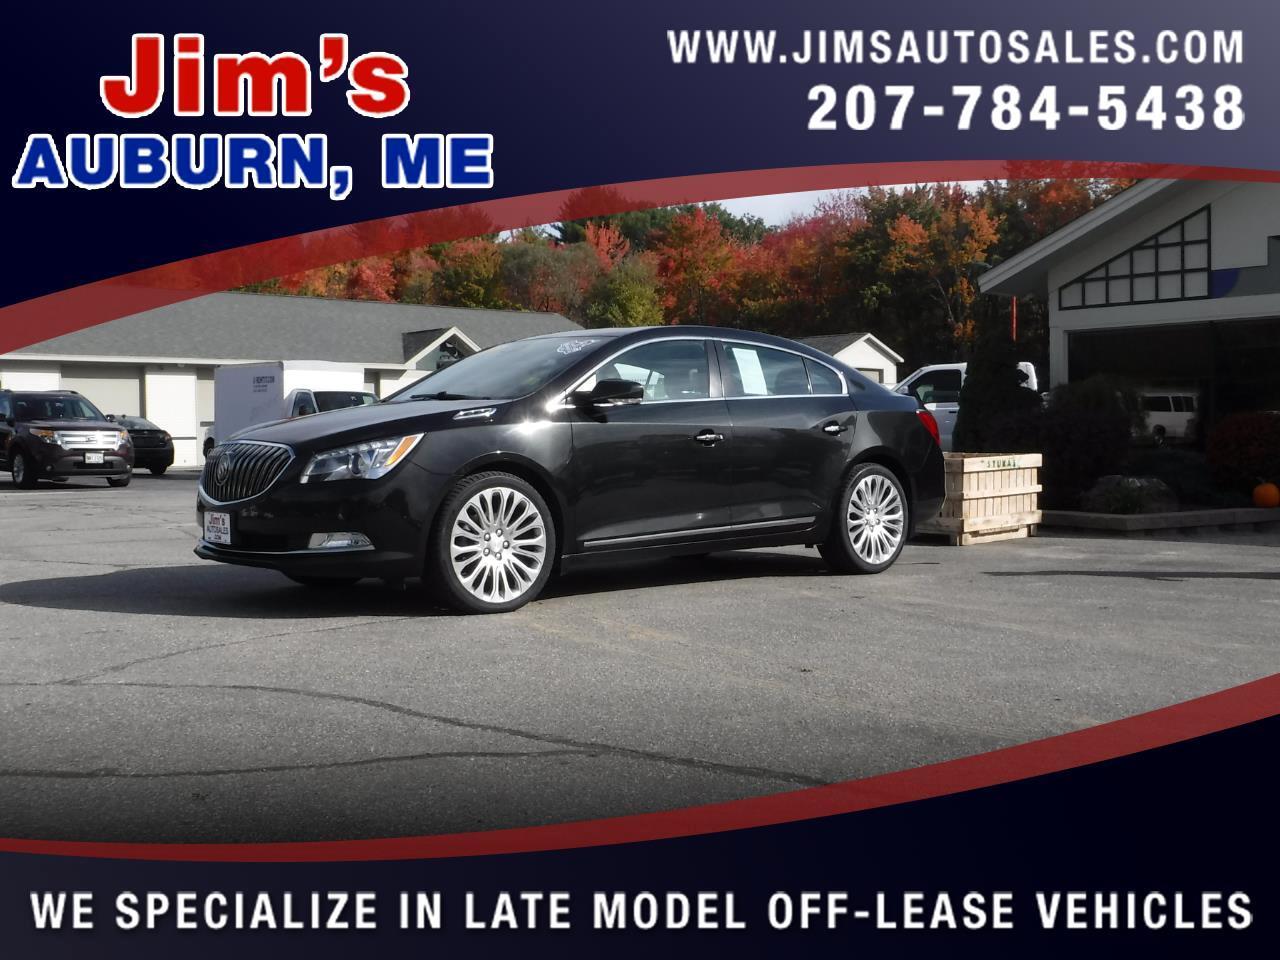 Buick LaCrosse 4dr Sdn Premium II  FWD 2015